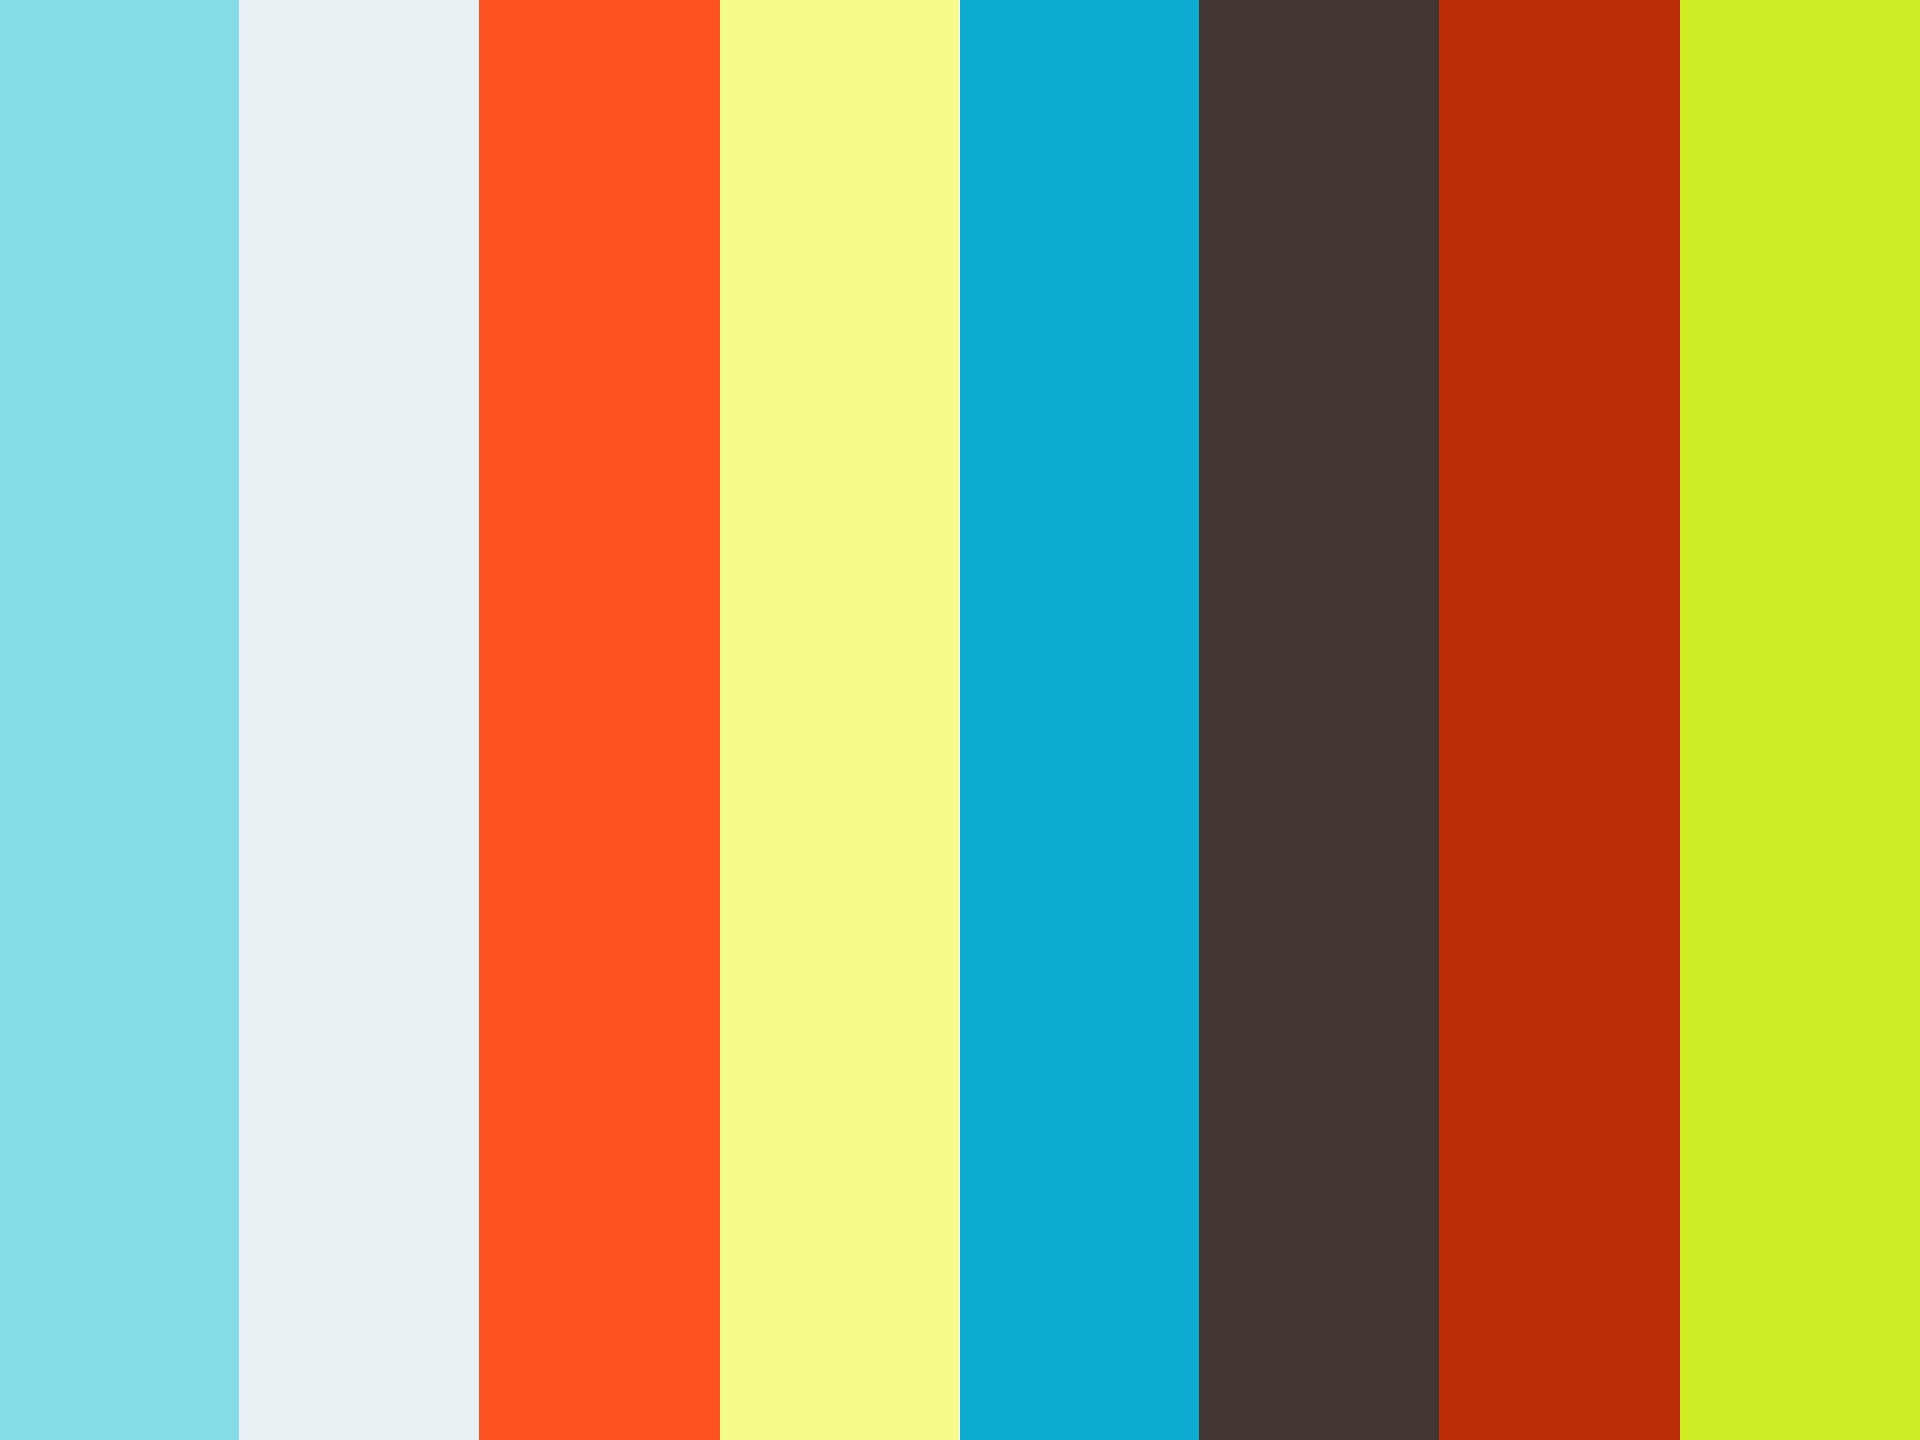 TOYOTA CAMRY - BLACK - 2017